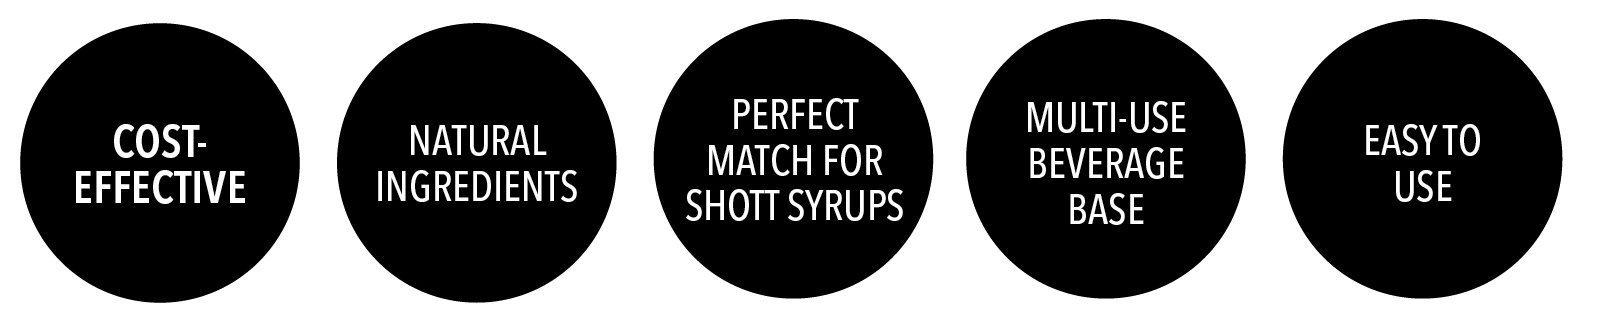 https://shottbeverages.com/wp-content/uploads/2019/09/black-icon.jpg